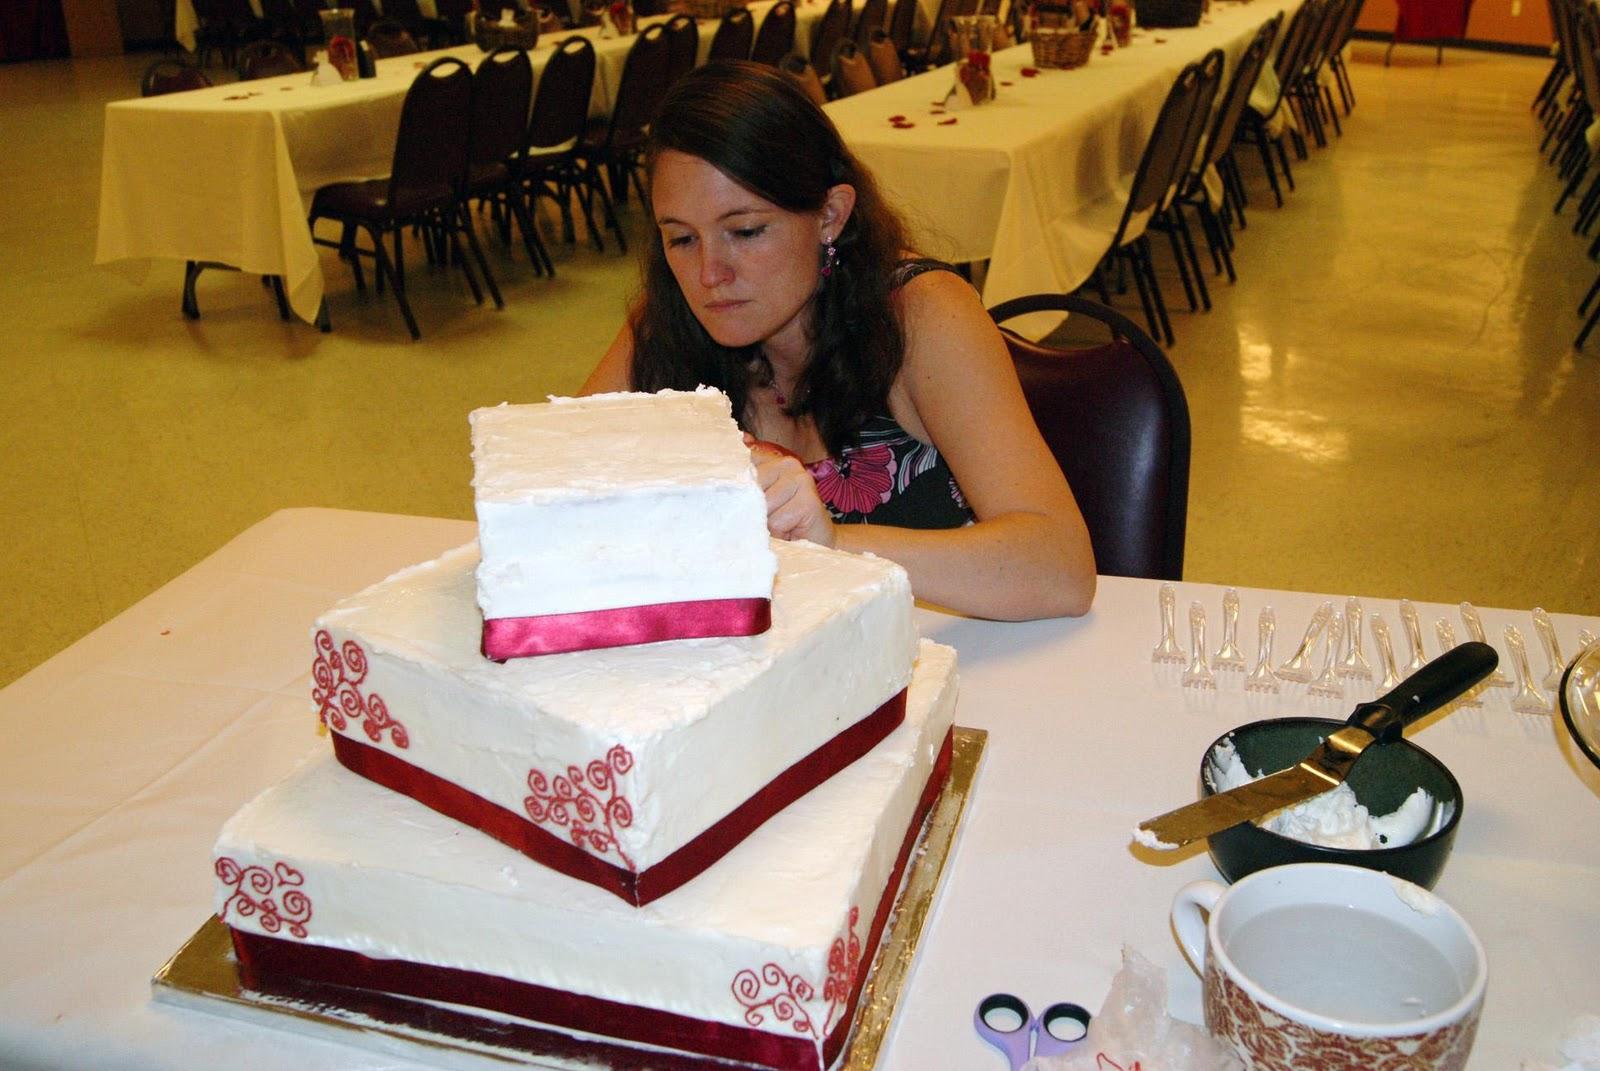 official wedding cake!